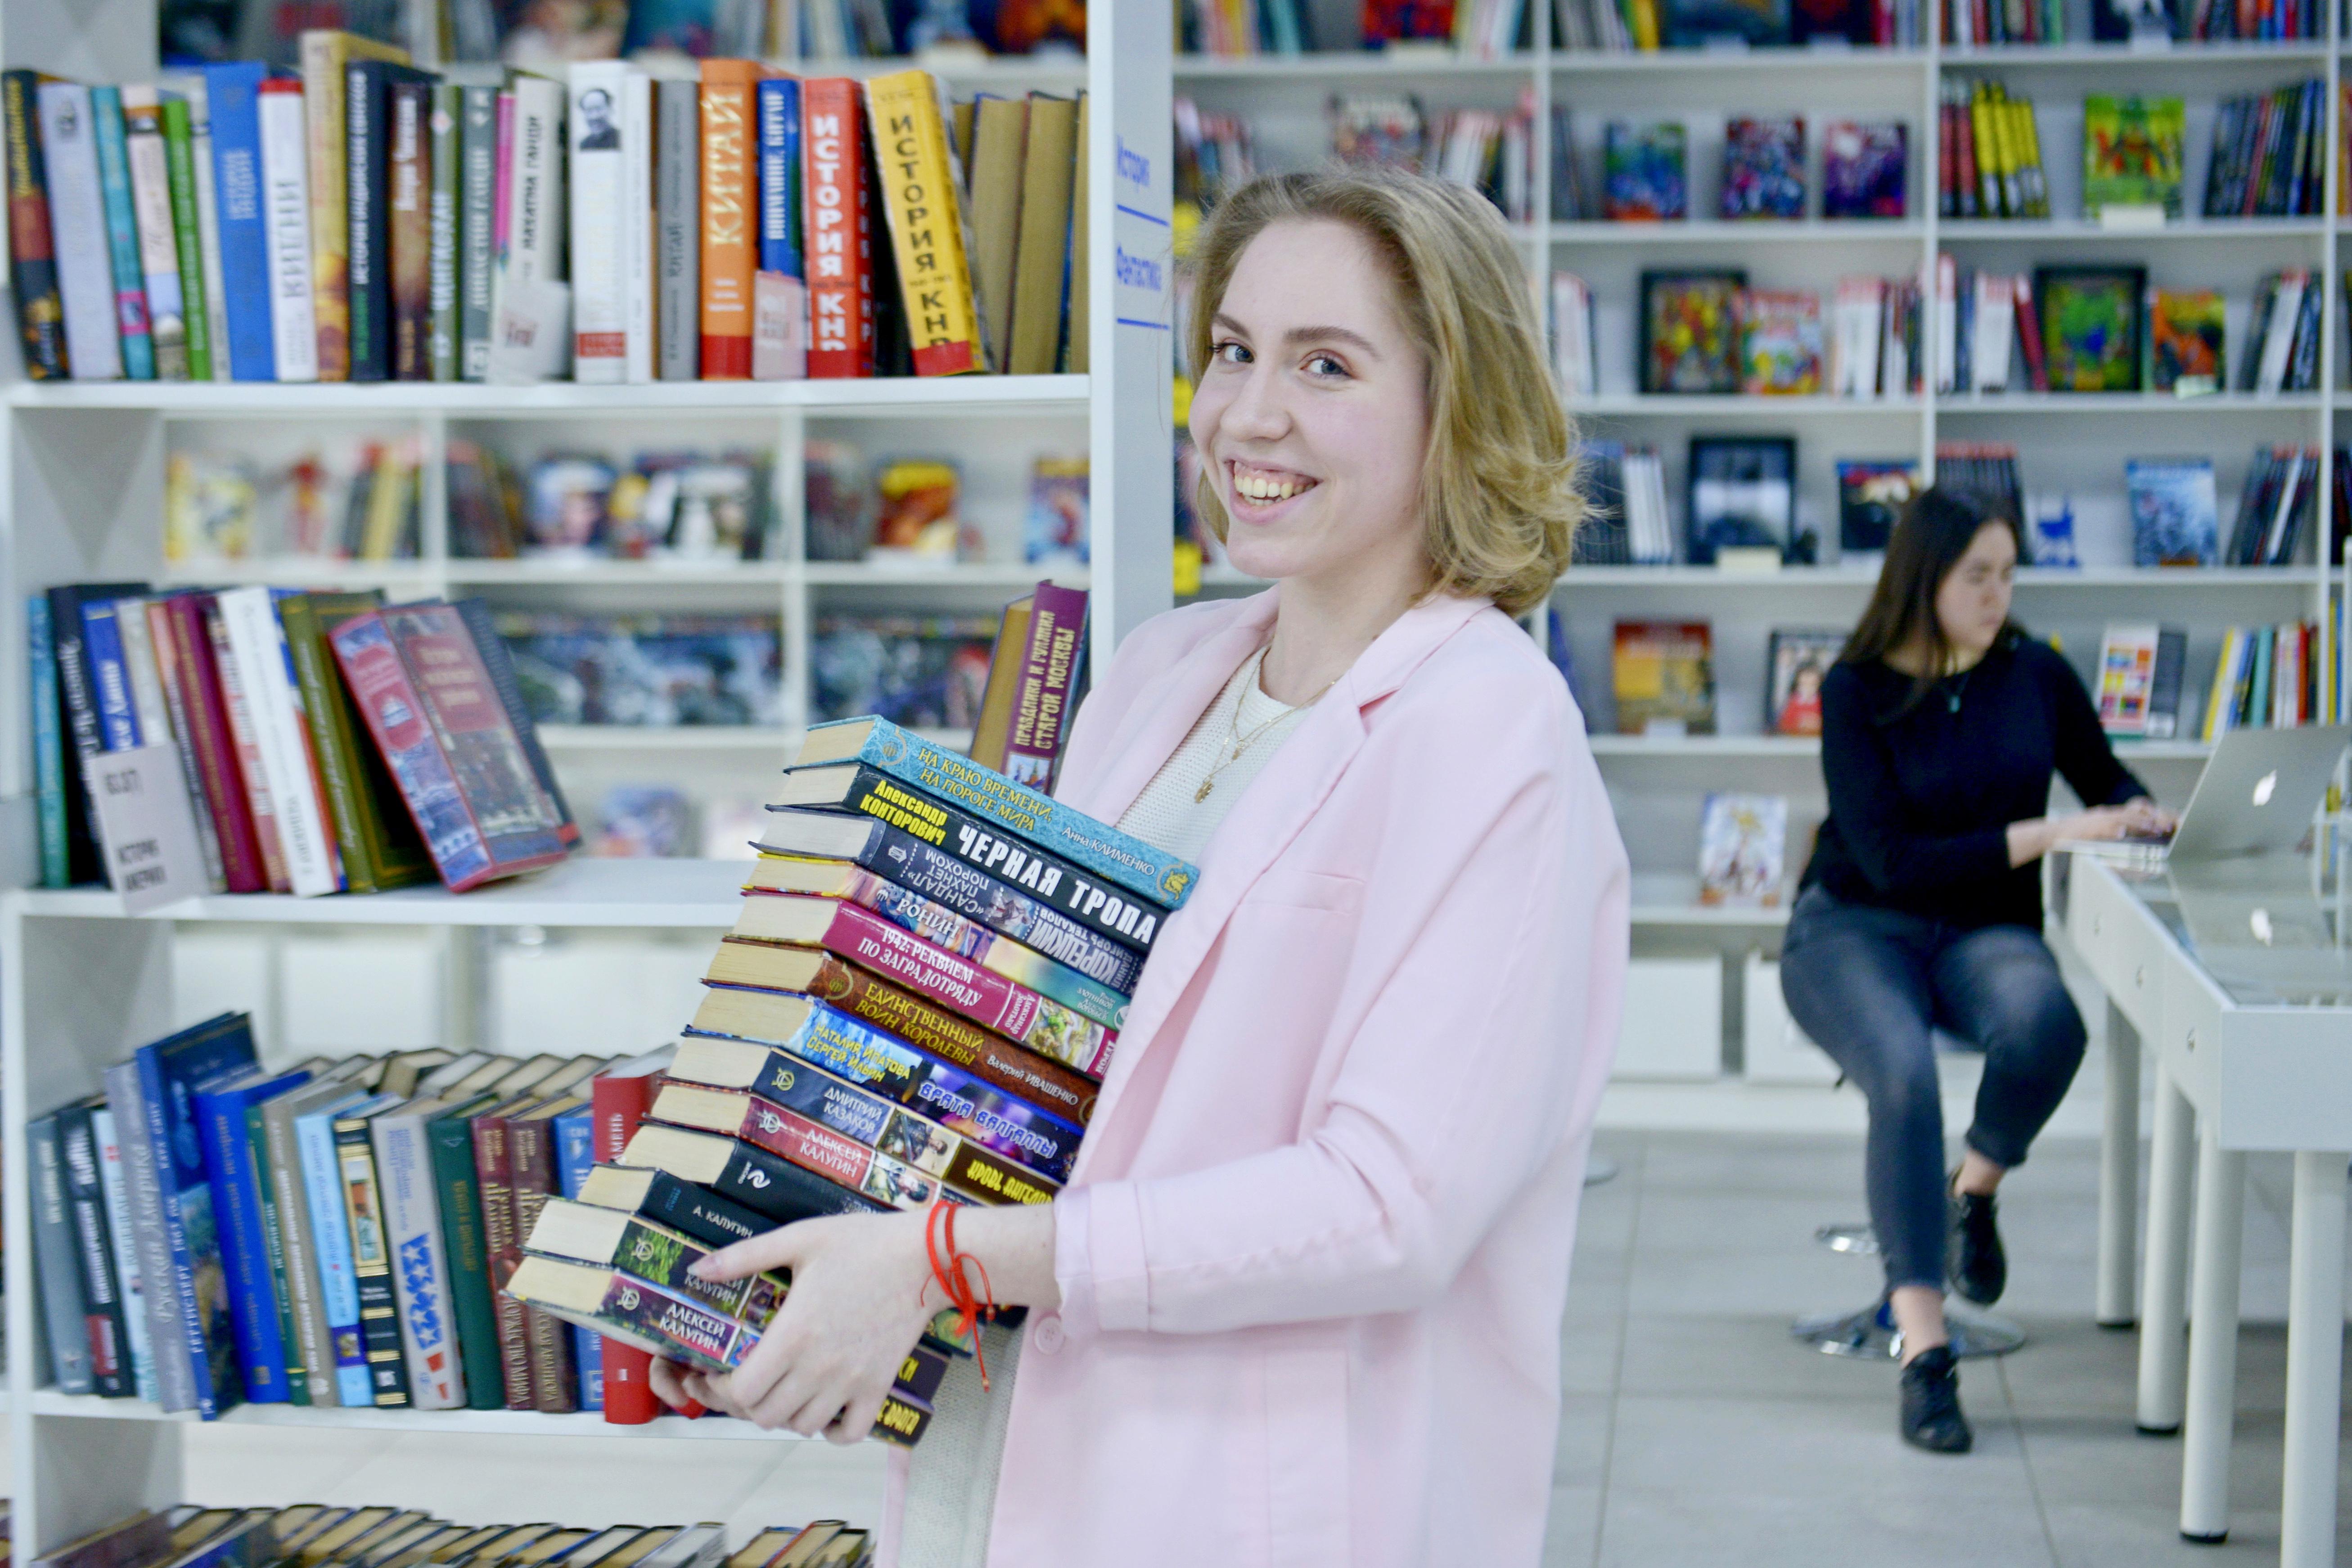 Москвичи проголосовали за модернизацию библиотек